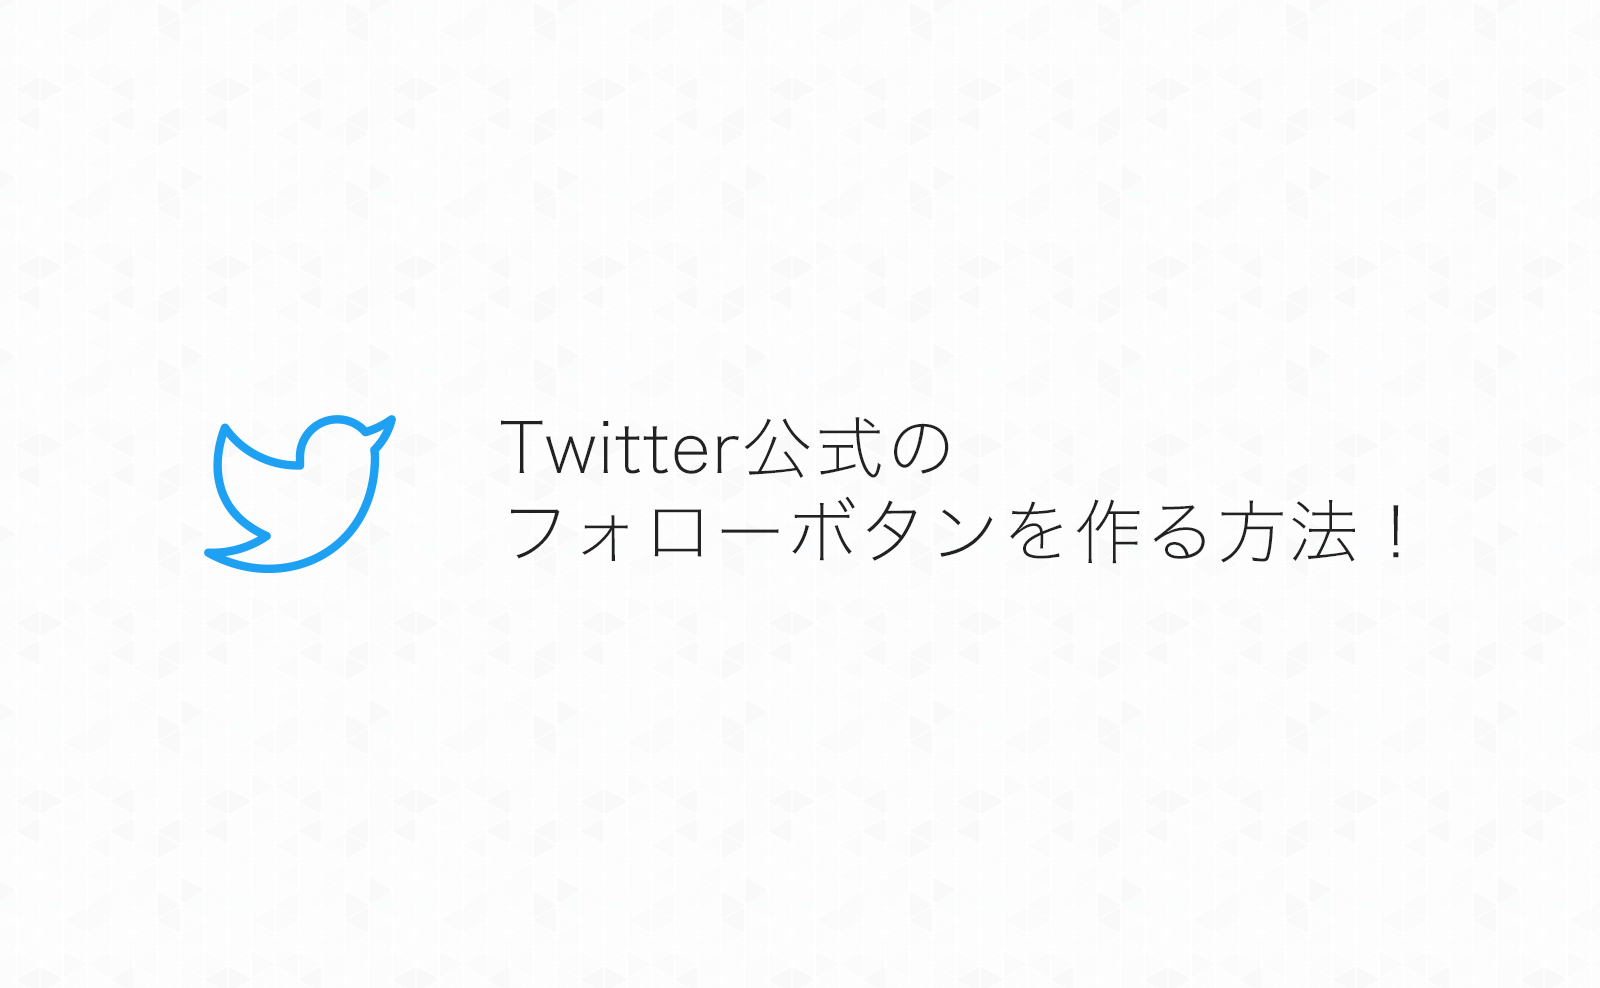 Twitter公式のフォローボタンをブログに設置する方法